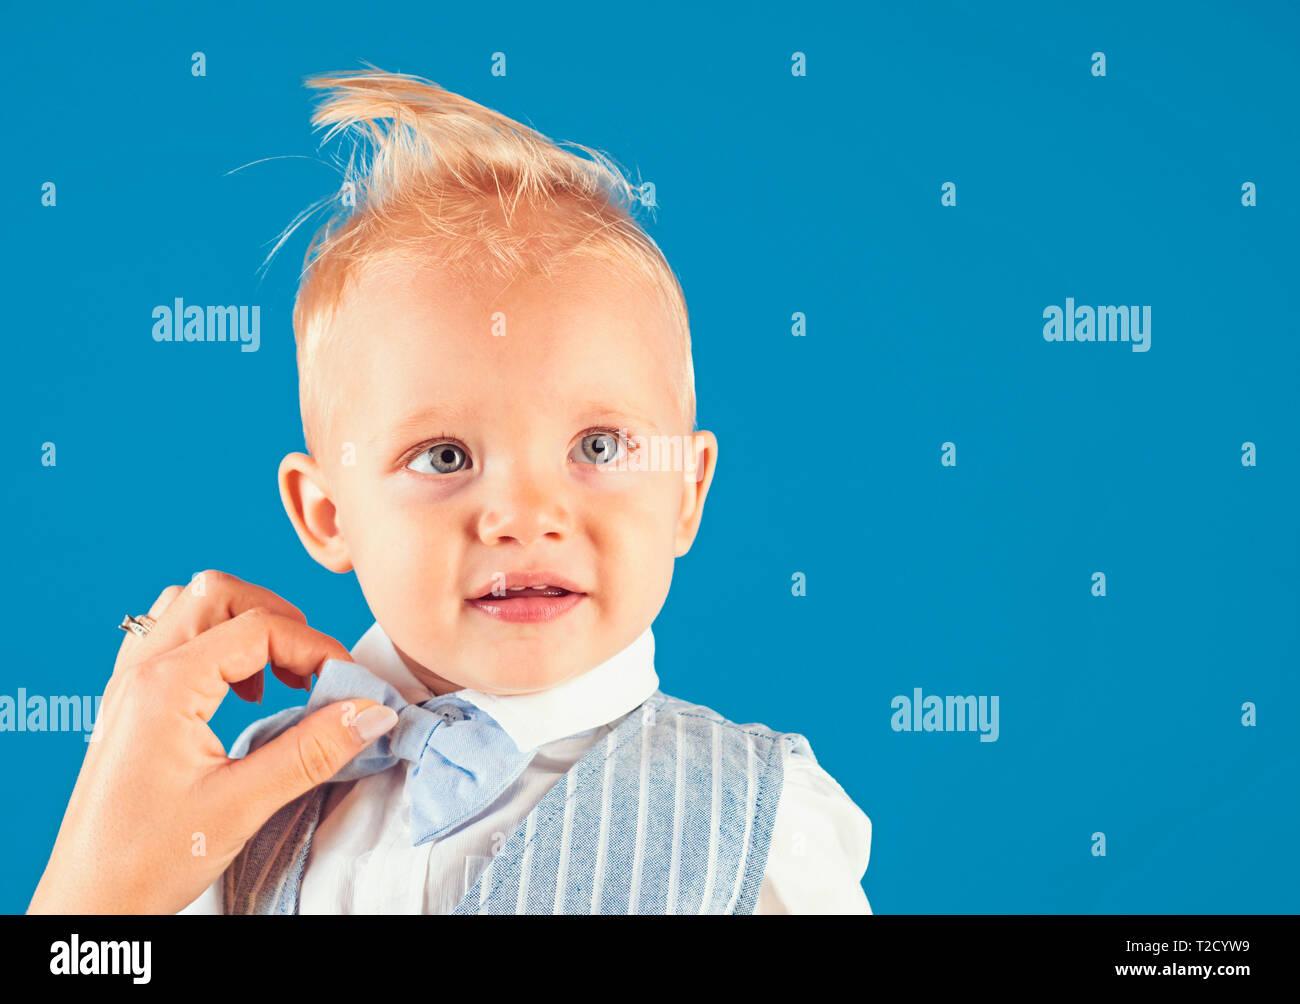 My hair my look. Boy child with stylish blond hair. Little child ...